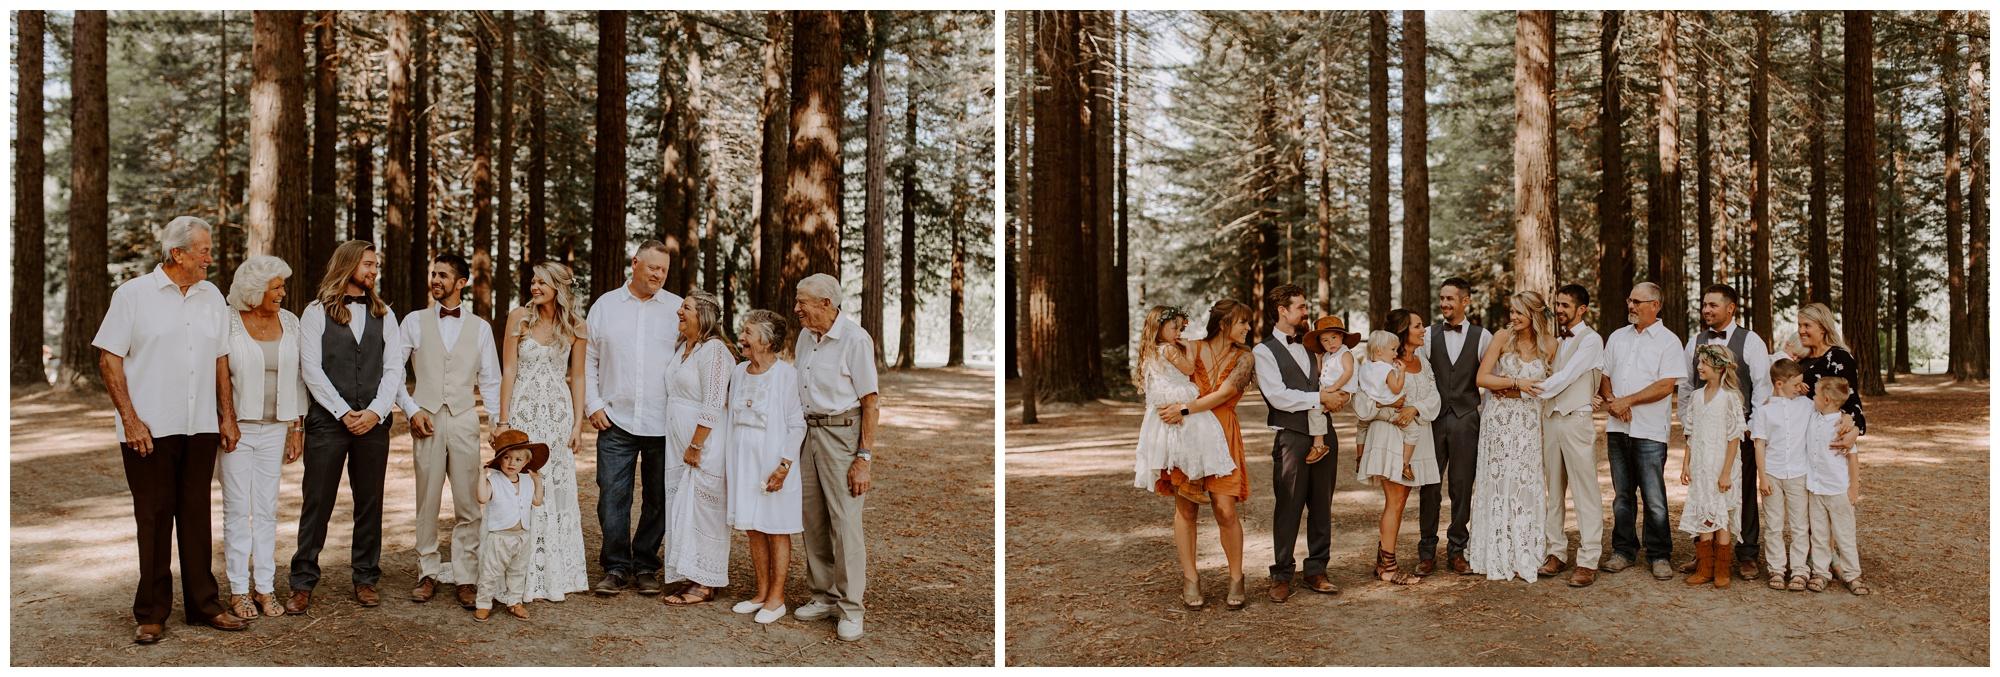 Redwood Festival Wedding Humbolt California - Jessica Heron Images_0015.jpg